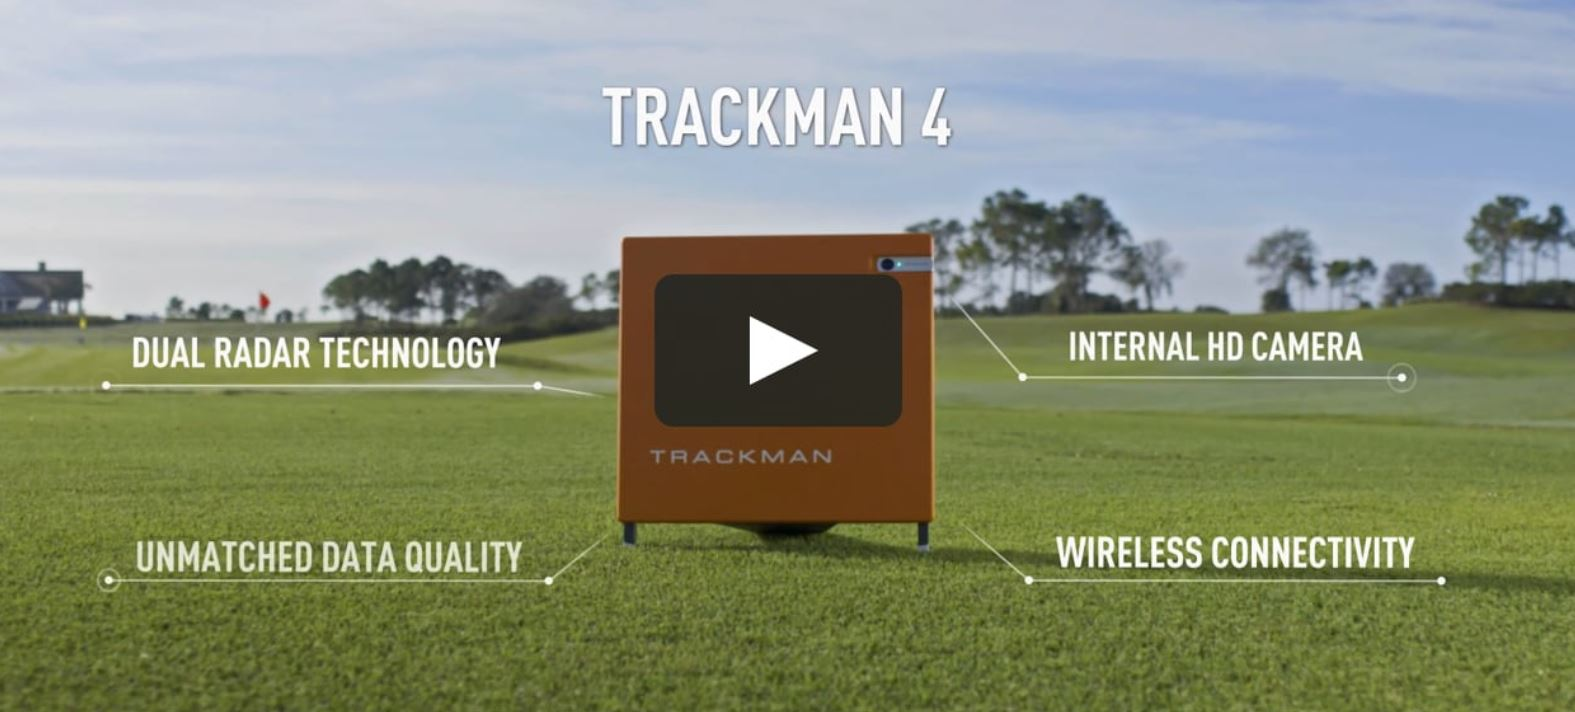 Trackman 4 5